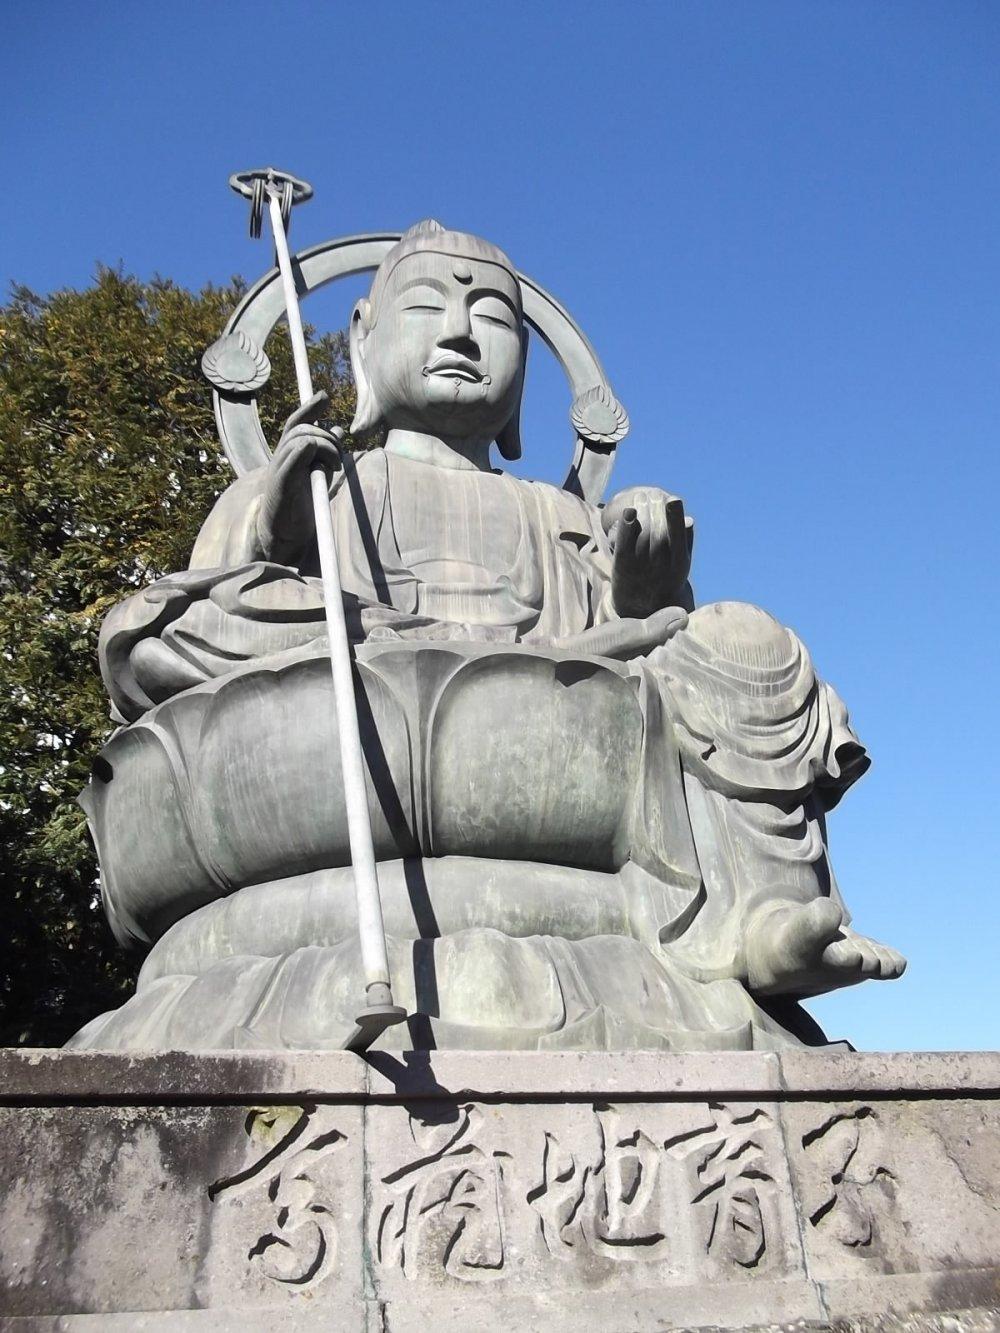 The large, serene Buddhist statue